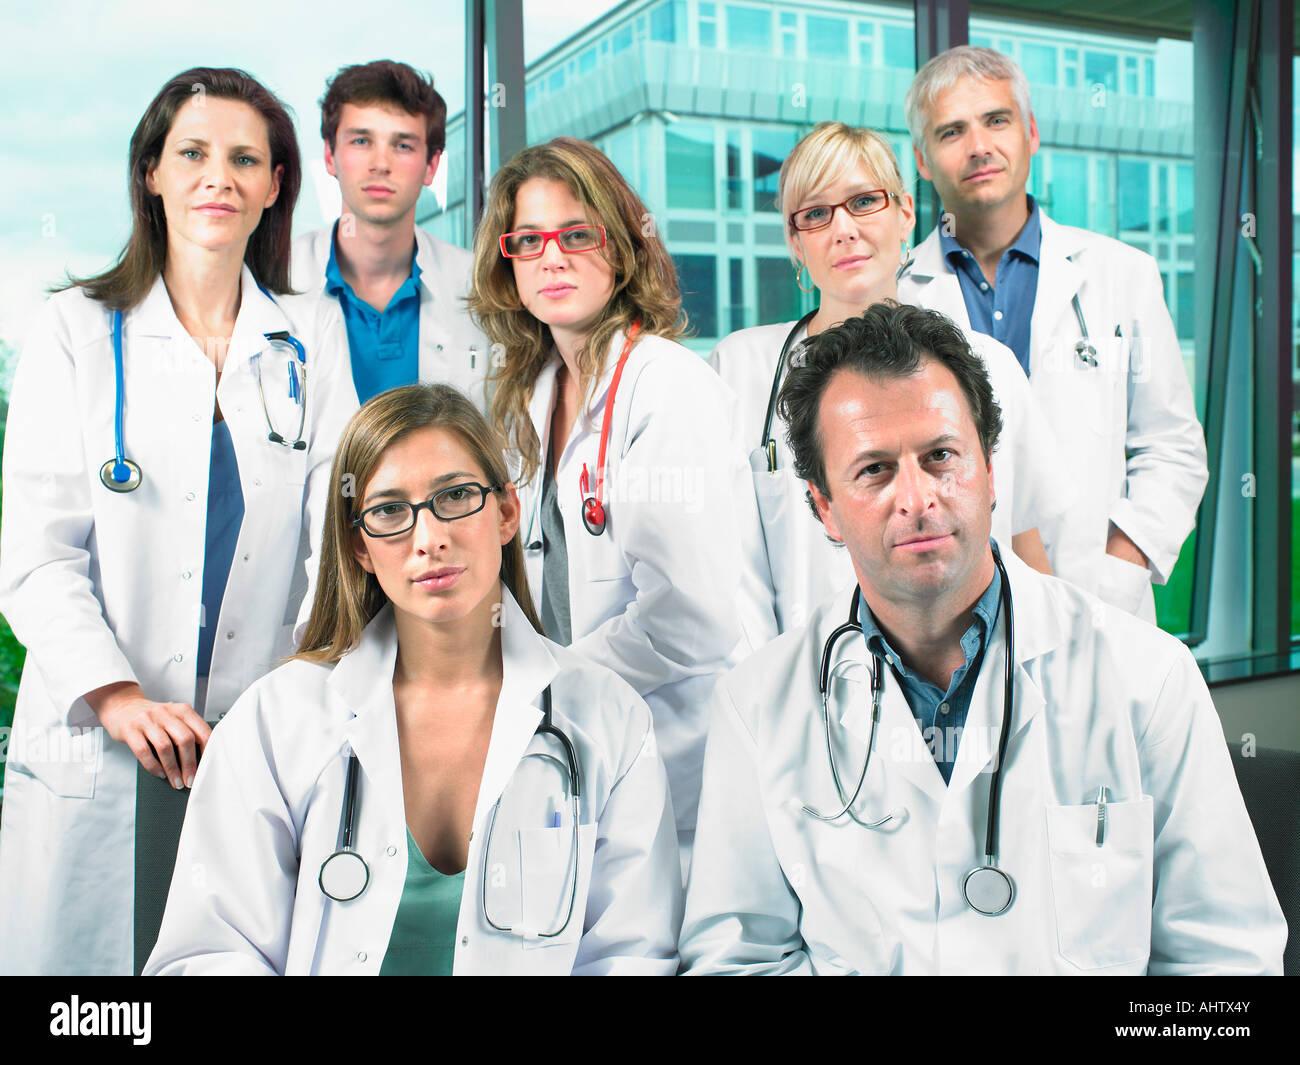 Group portrait of seven doctors. - Stock Image